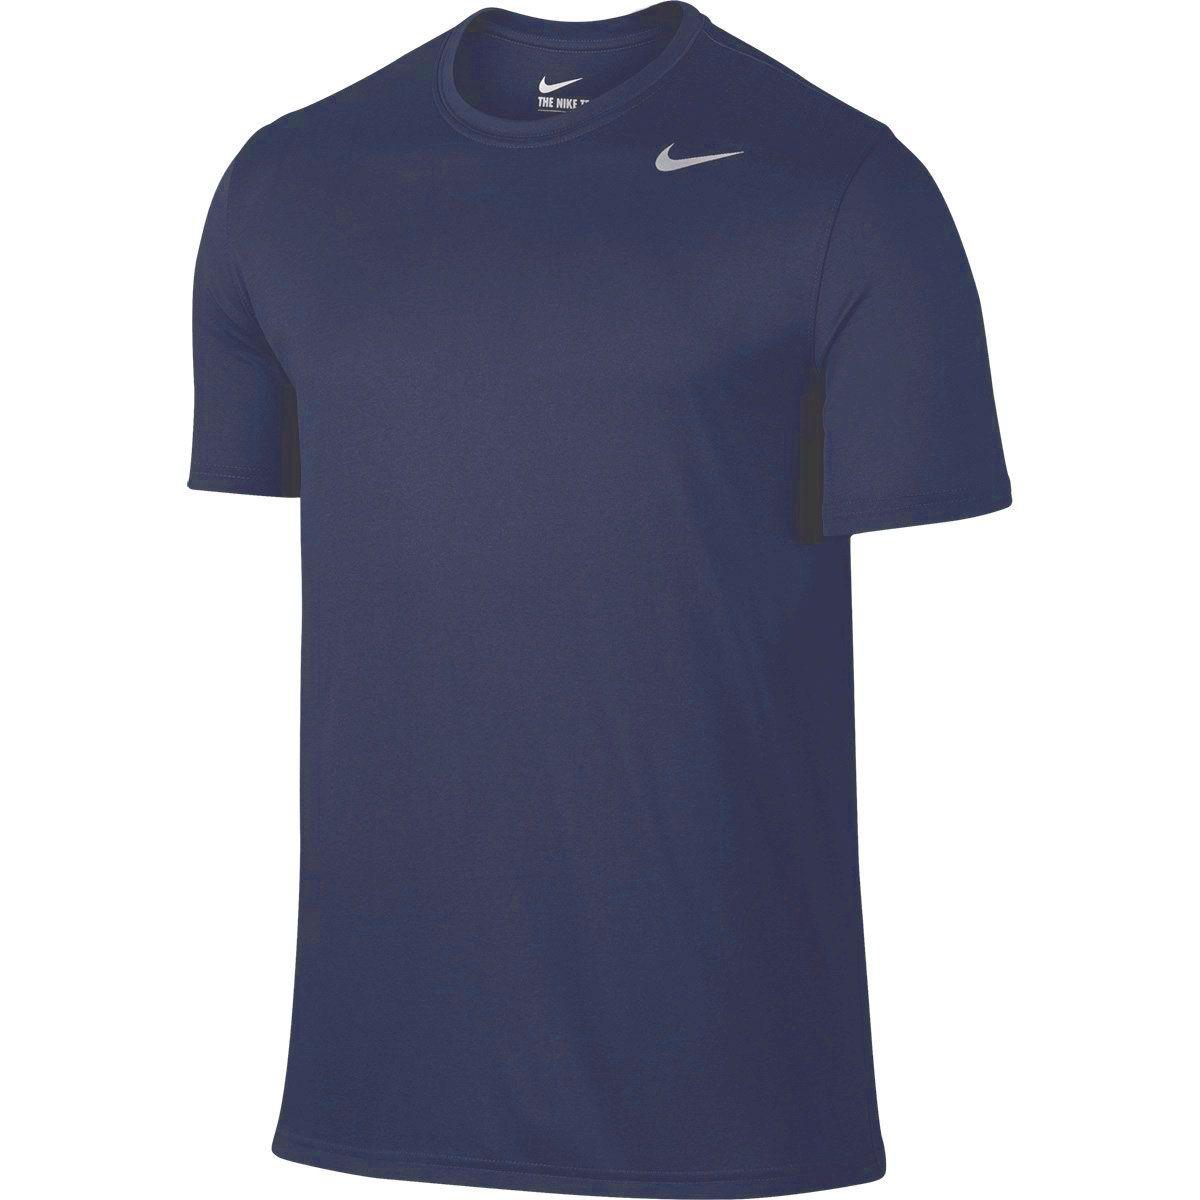 Camiseta Nike Legend 2.0 Masculina  - REAL ESPORTE